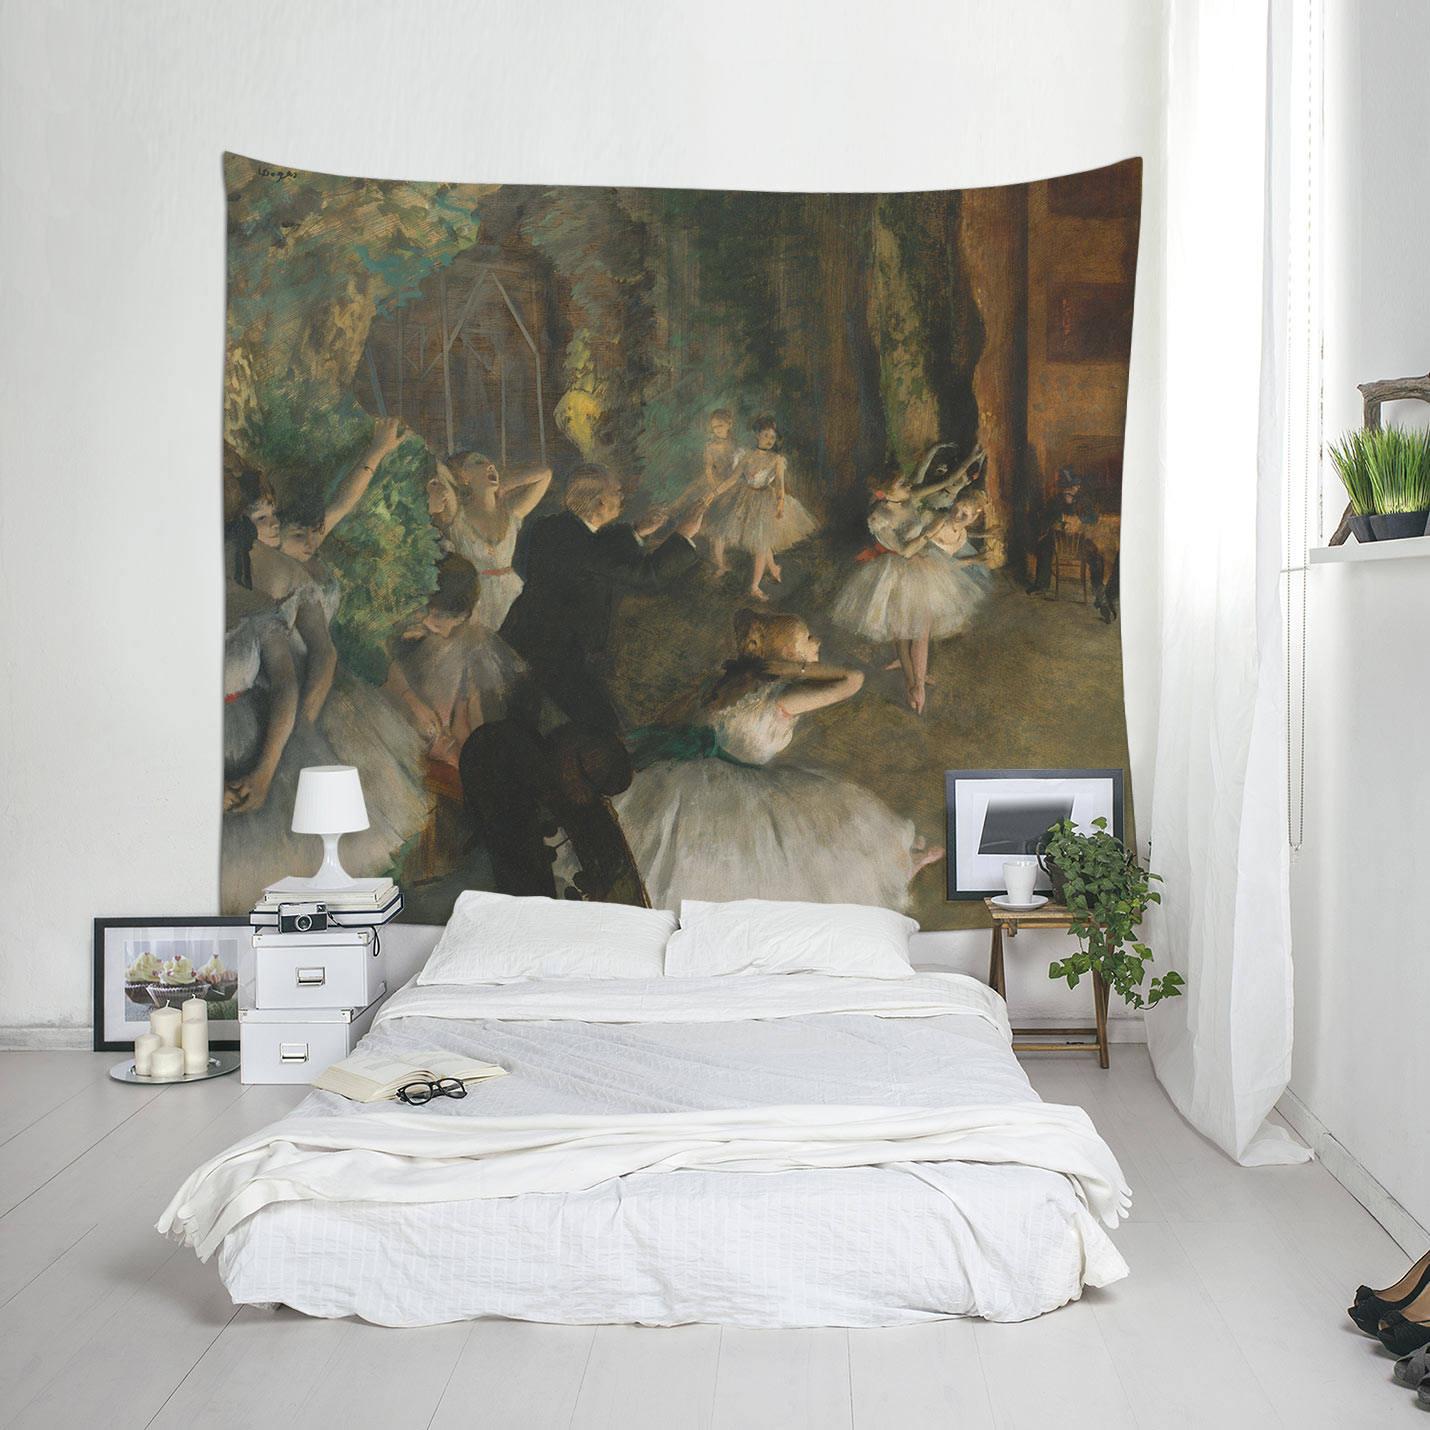 Degas Edgar Degas-Druck große Wand-Dekor Wandteppich Deko   Etsy